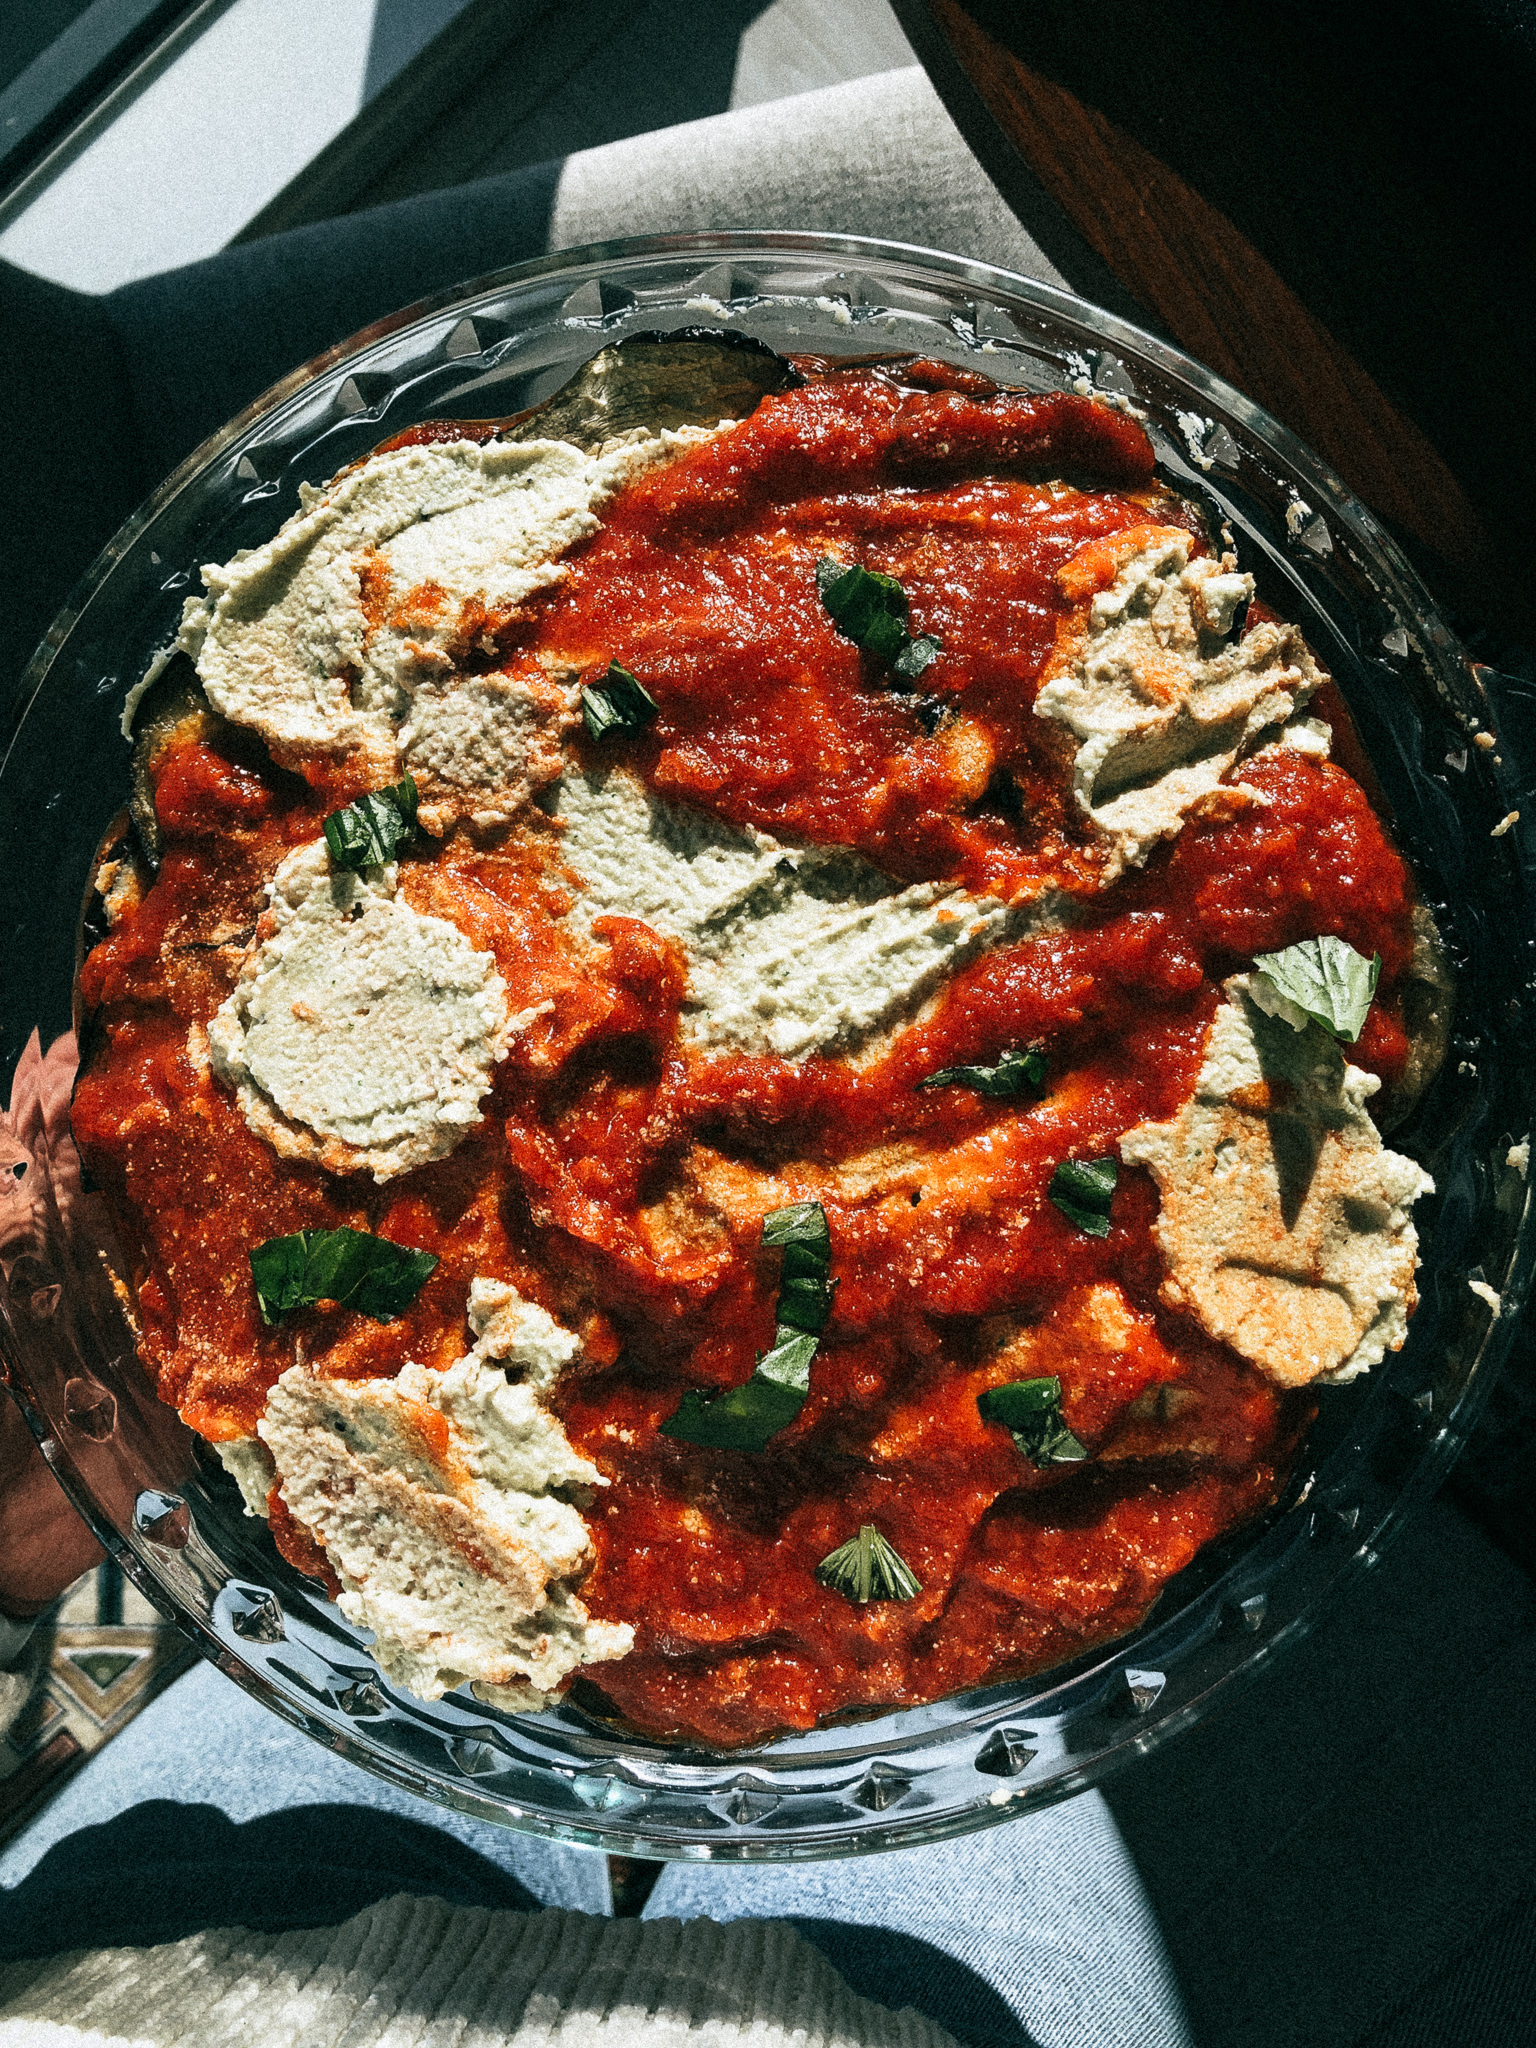 dairy free and gluten free eggplant ricotta 'lasagna' (paleo, vegan).